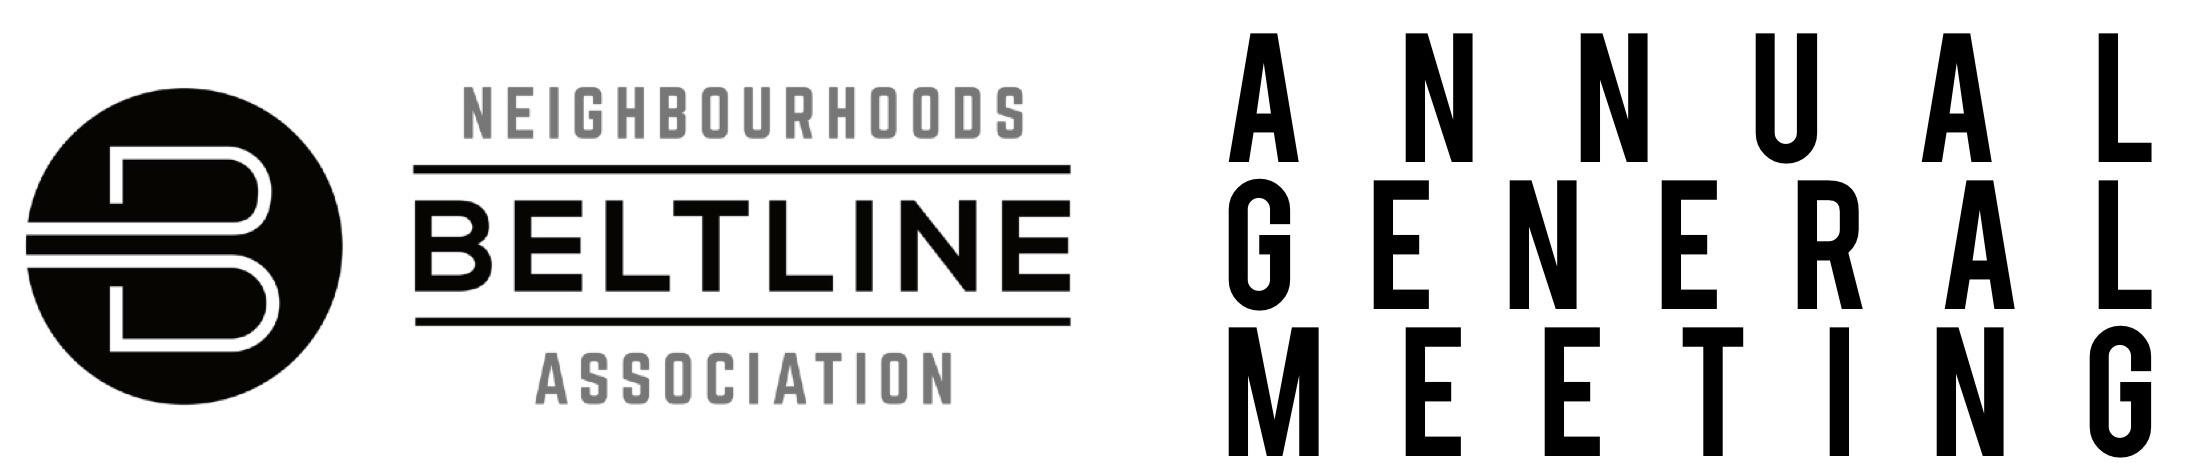 AGM_-_Artist_Talk.jpg